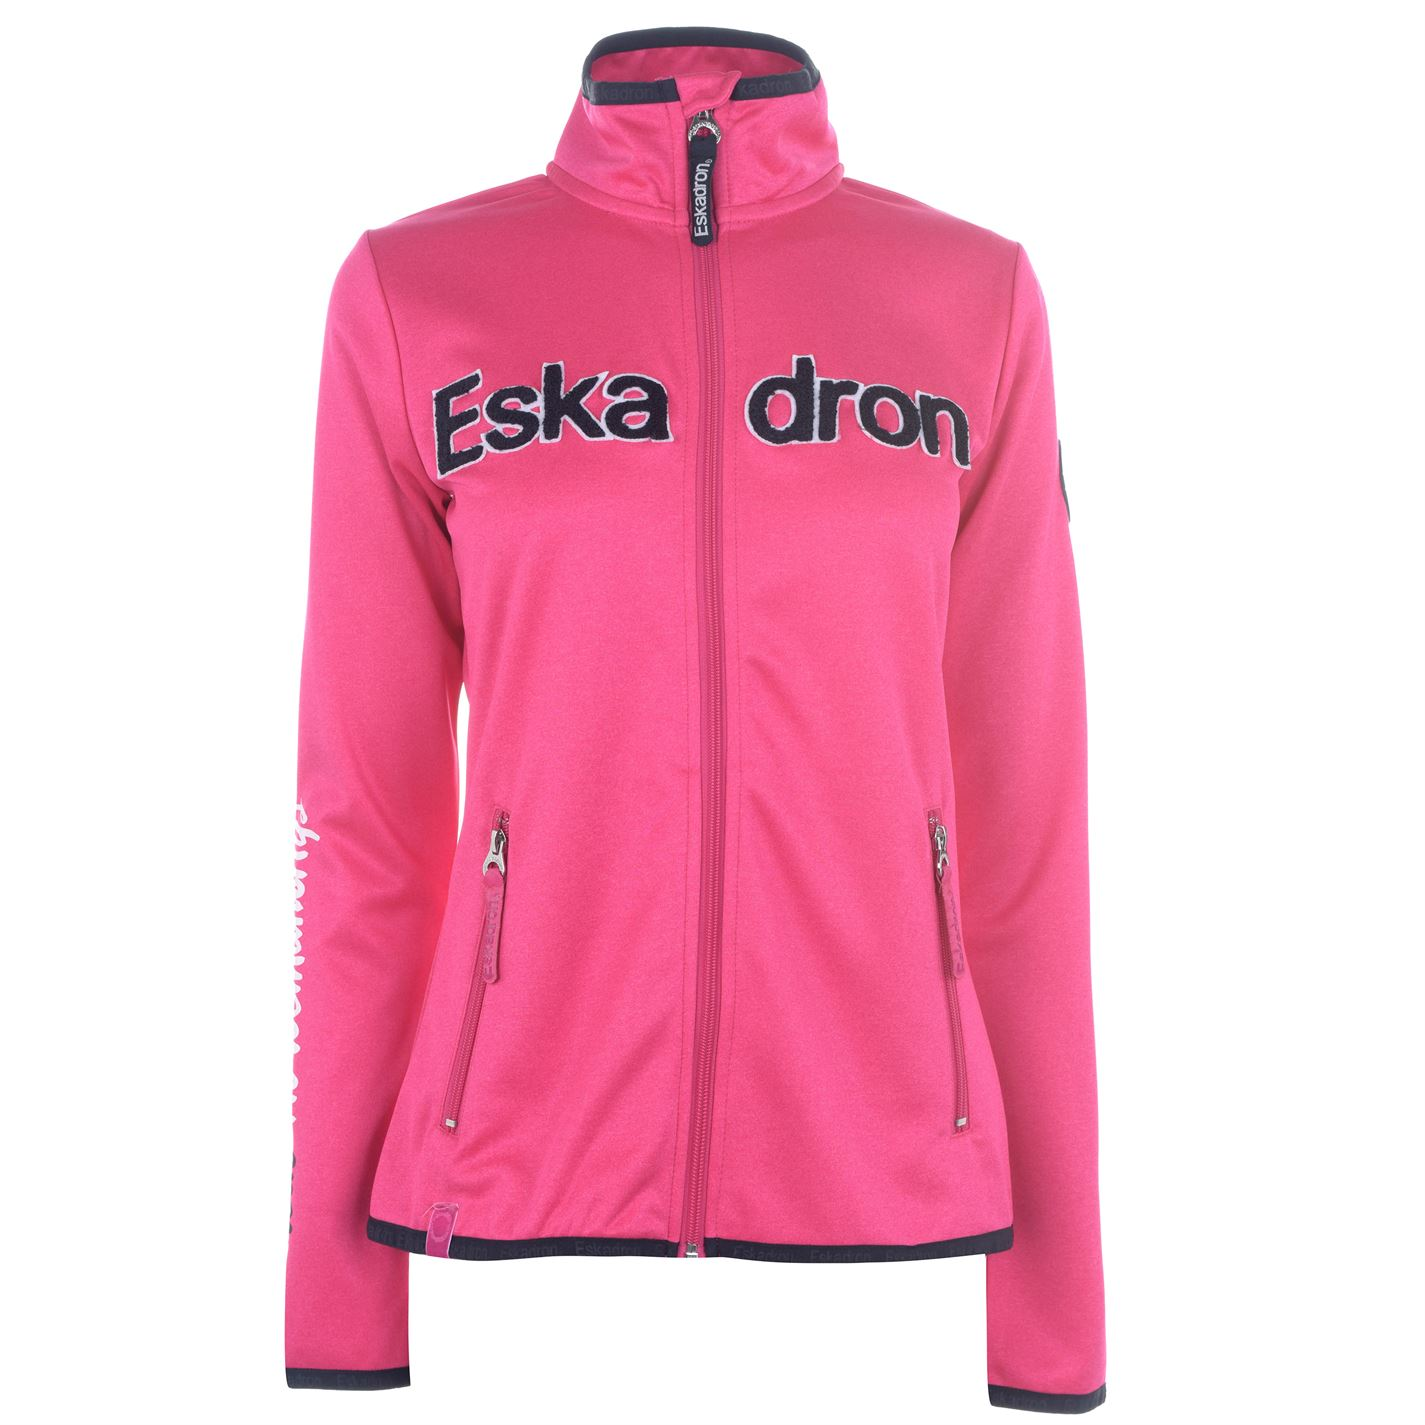 Pulover Eskadron Nicky pentru Femei roz